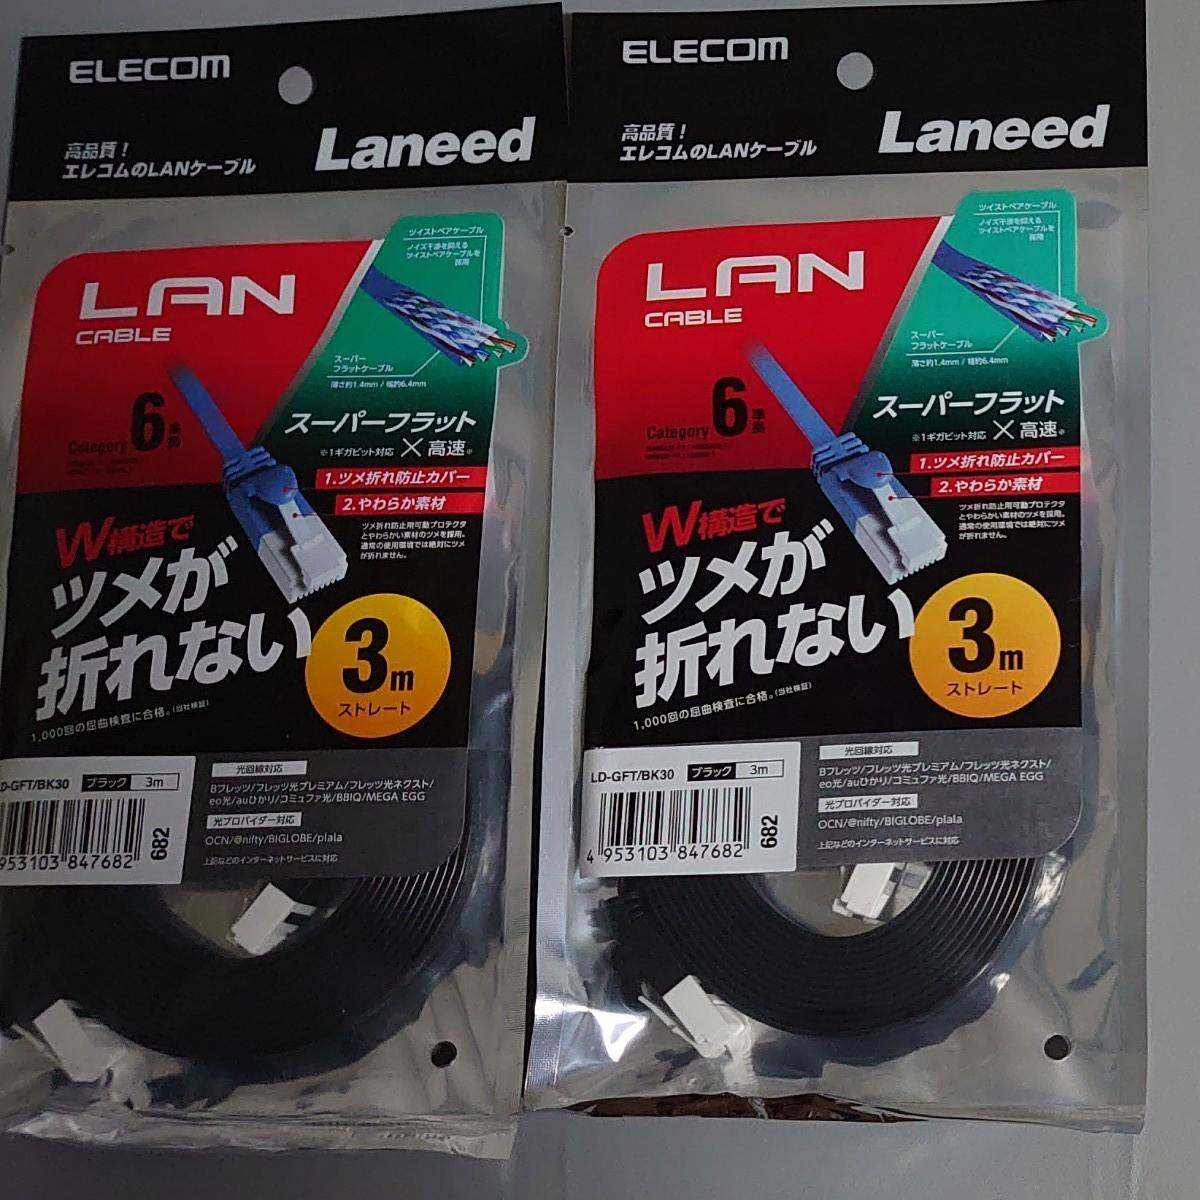 ELECOM LANケーブル 3m 2本 LD-GFT/BK30